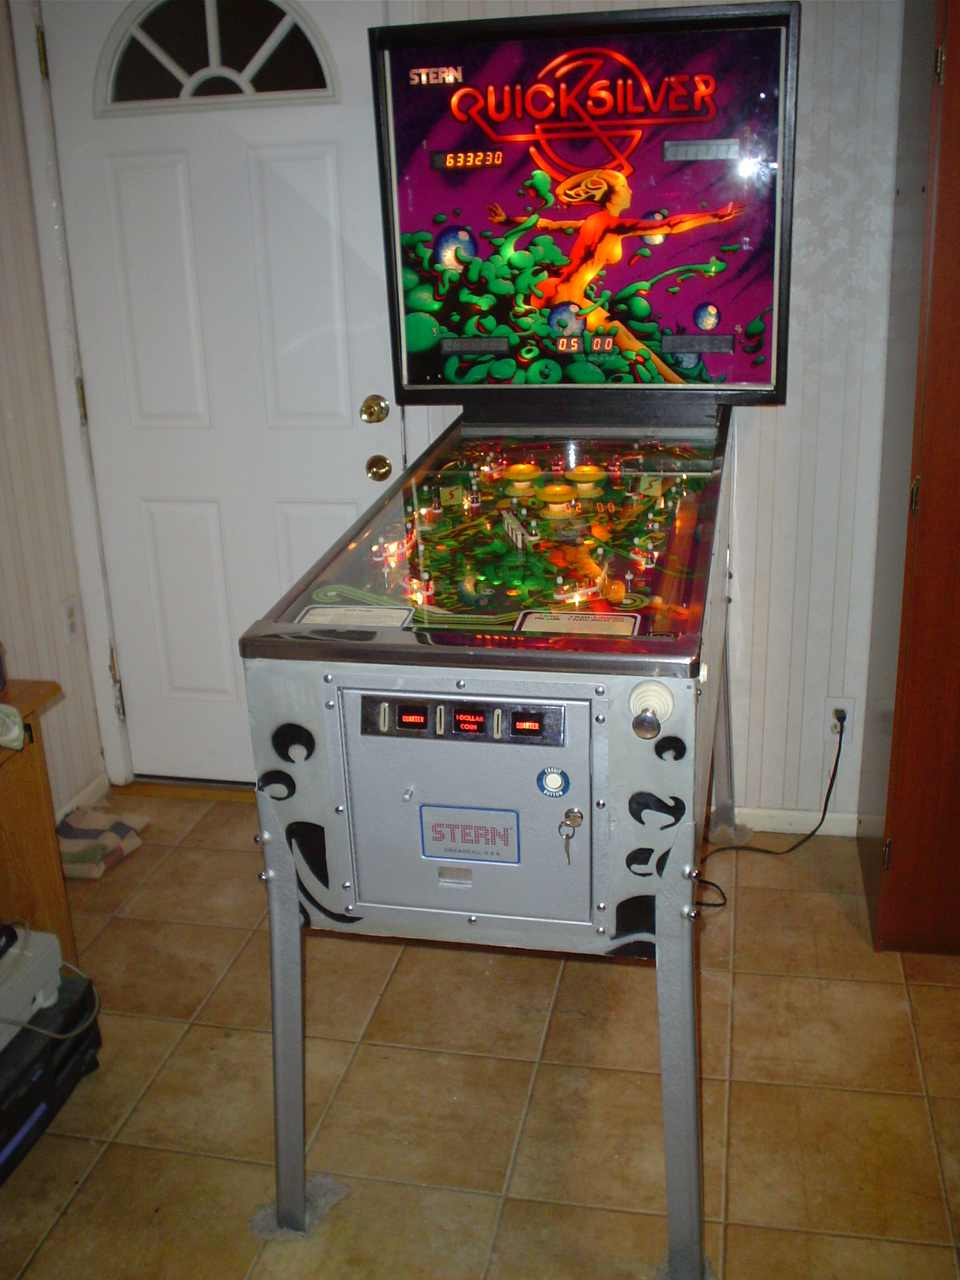 Stern Quicksilver Pinball Machine #1 - Pinballmania LLC